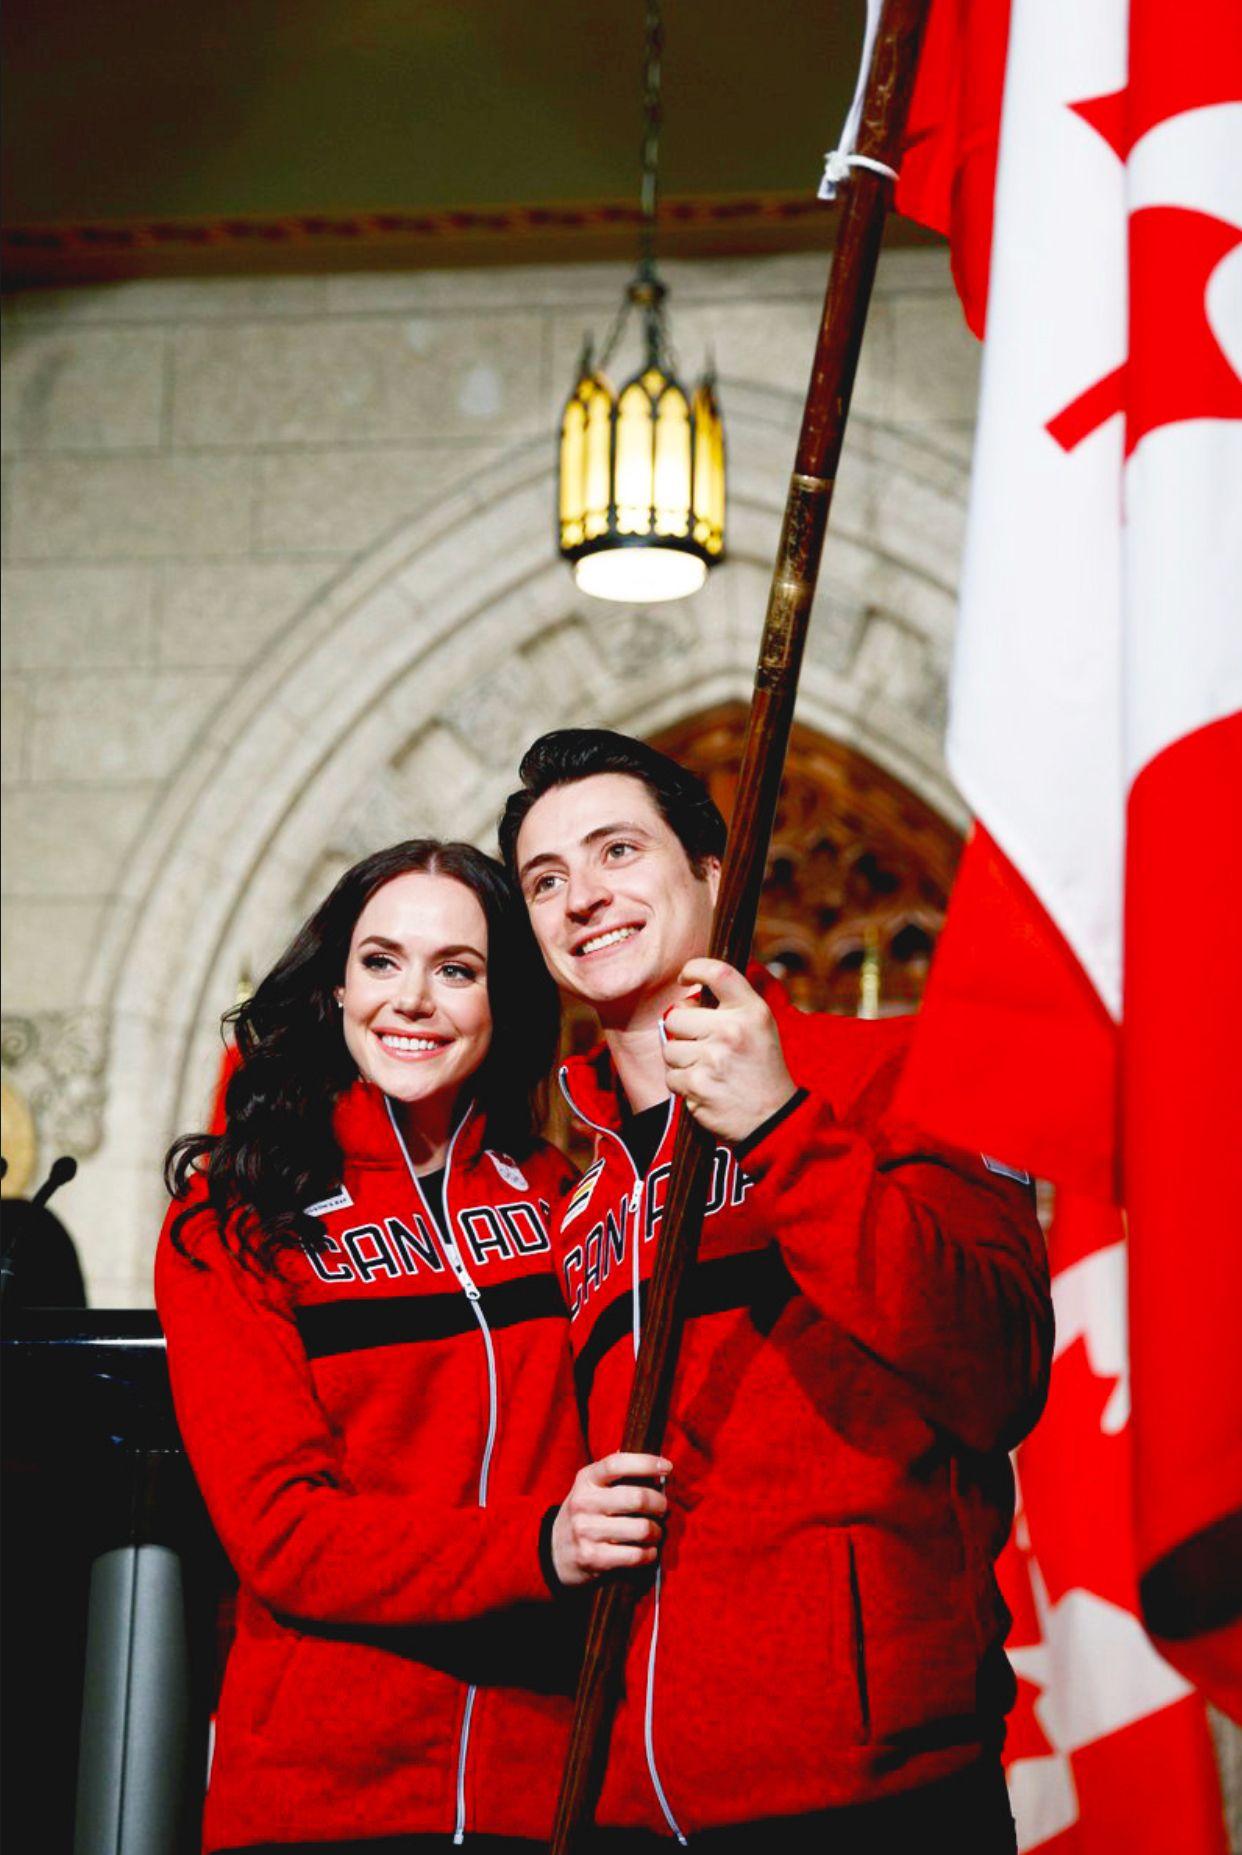 Tessa Virtue And Scott Moir Chosen Be Canadian Flag Bearers At The 2018 Pyeongchang Olympic Games Tessa And Scott Tessa Virtue Scott Moir Virtue And Moir